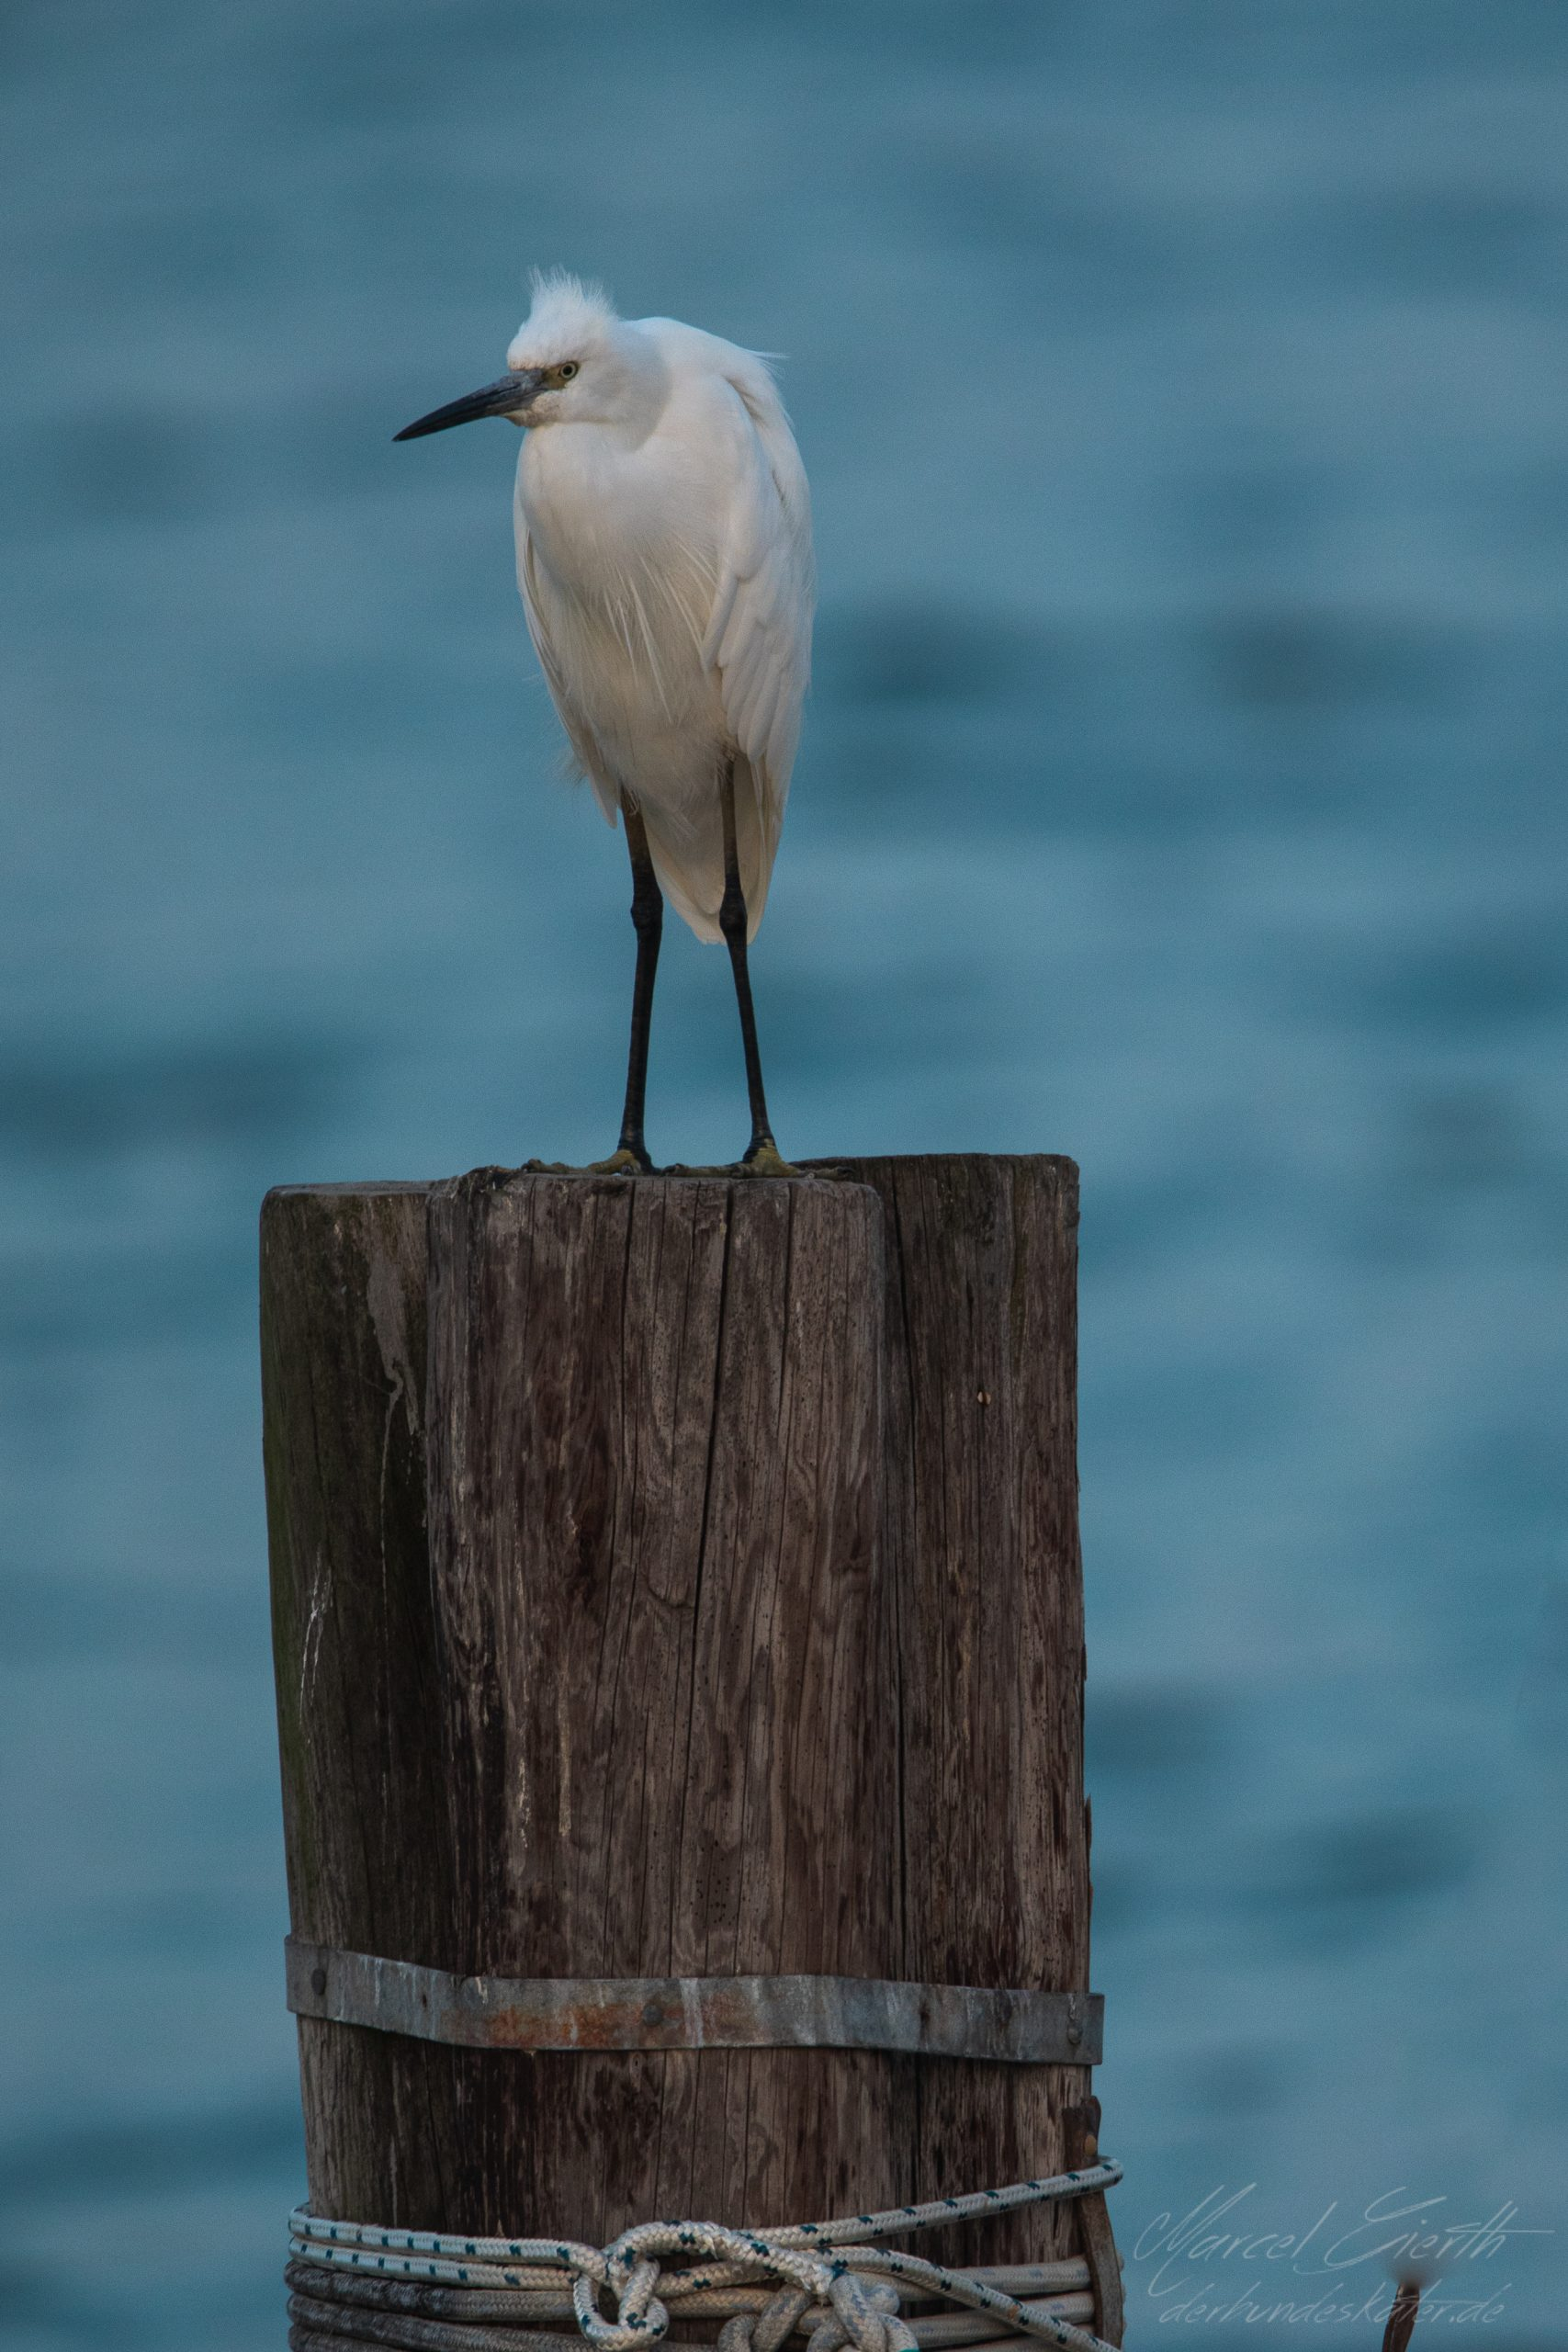 Seidenreiher - Little egret - Egretta garzetta - Fotograf Marcel Gierth